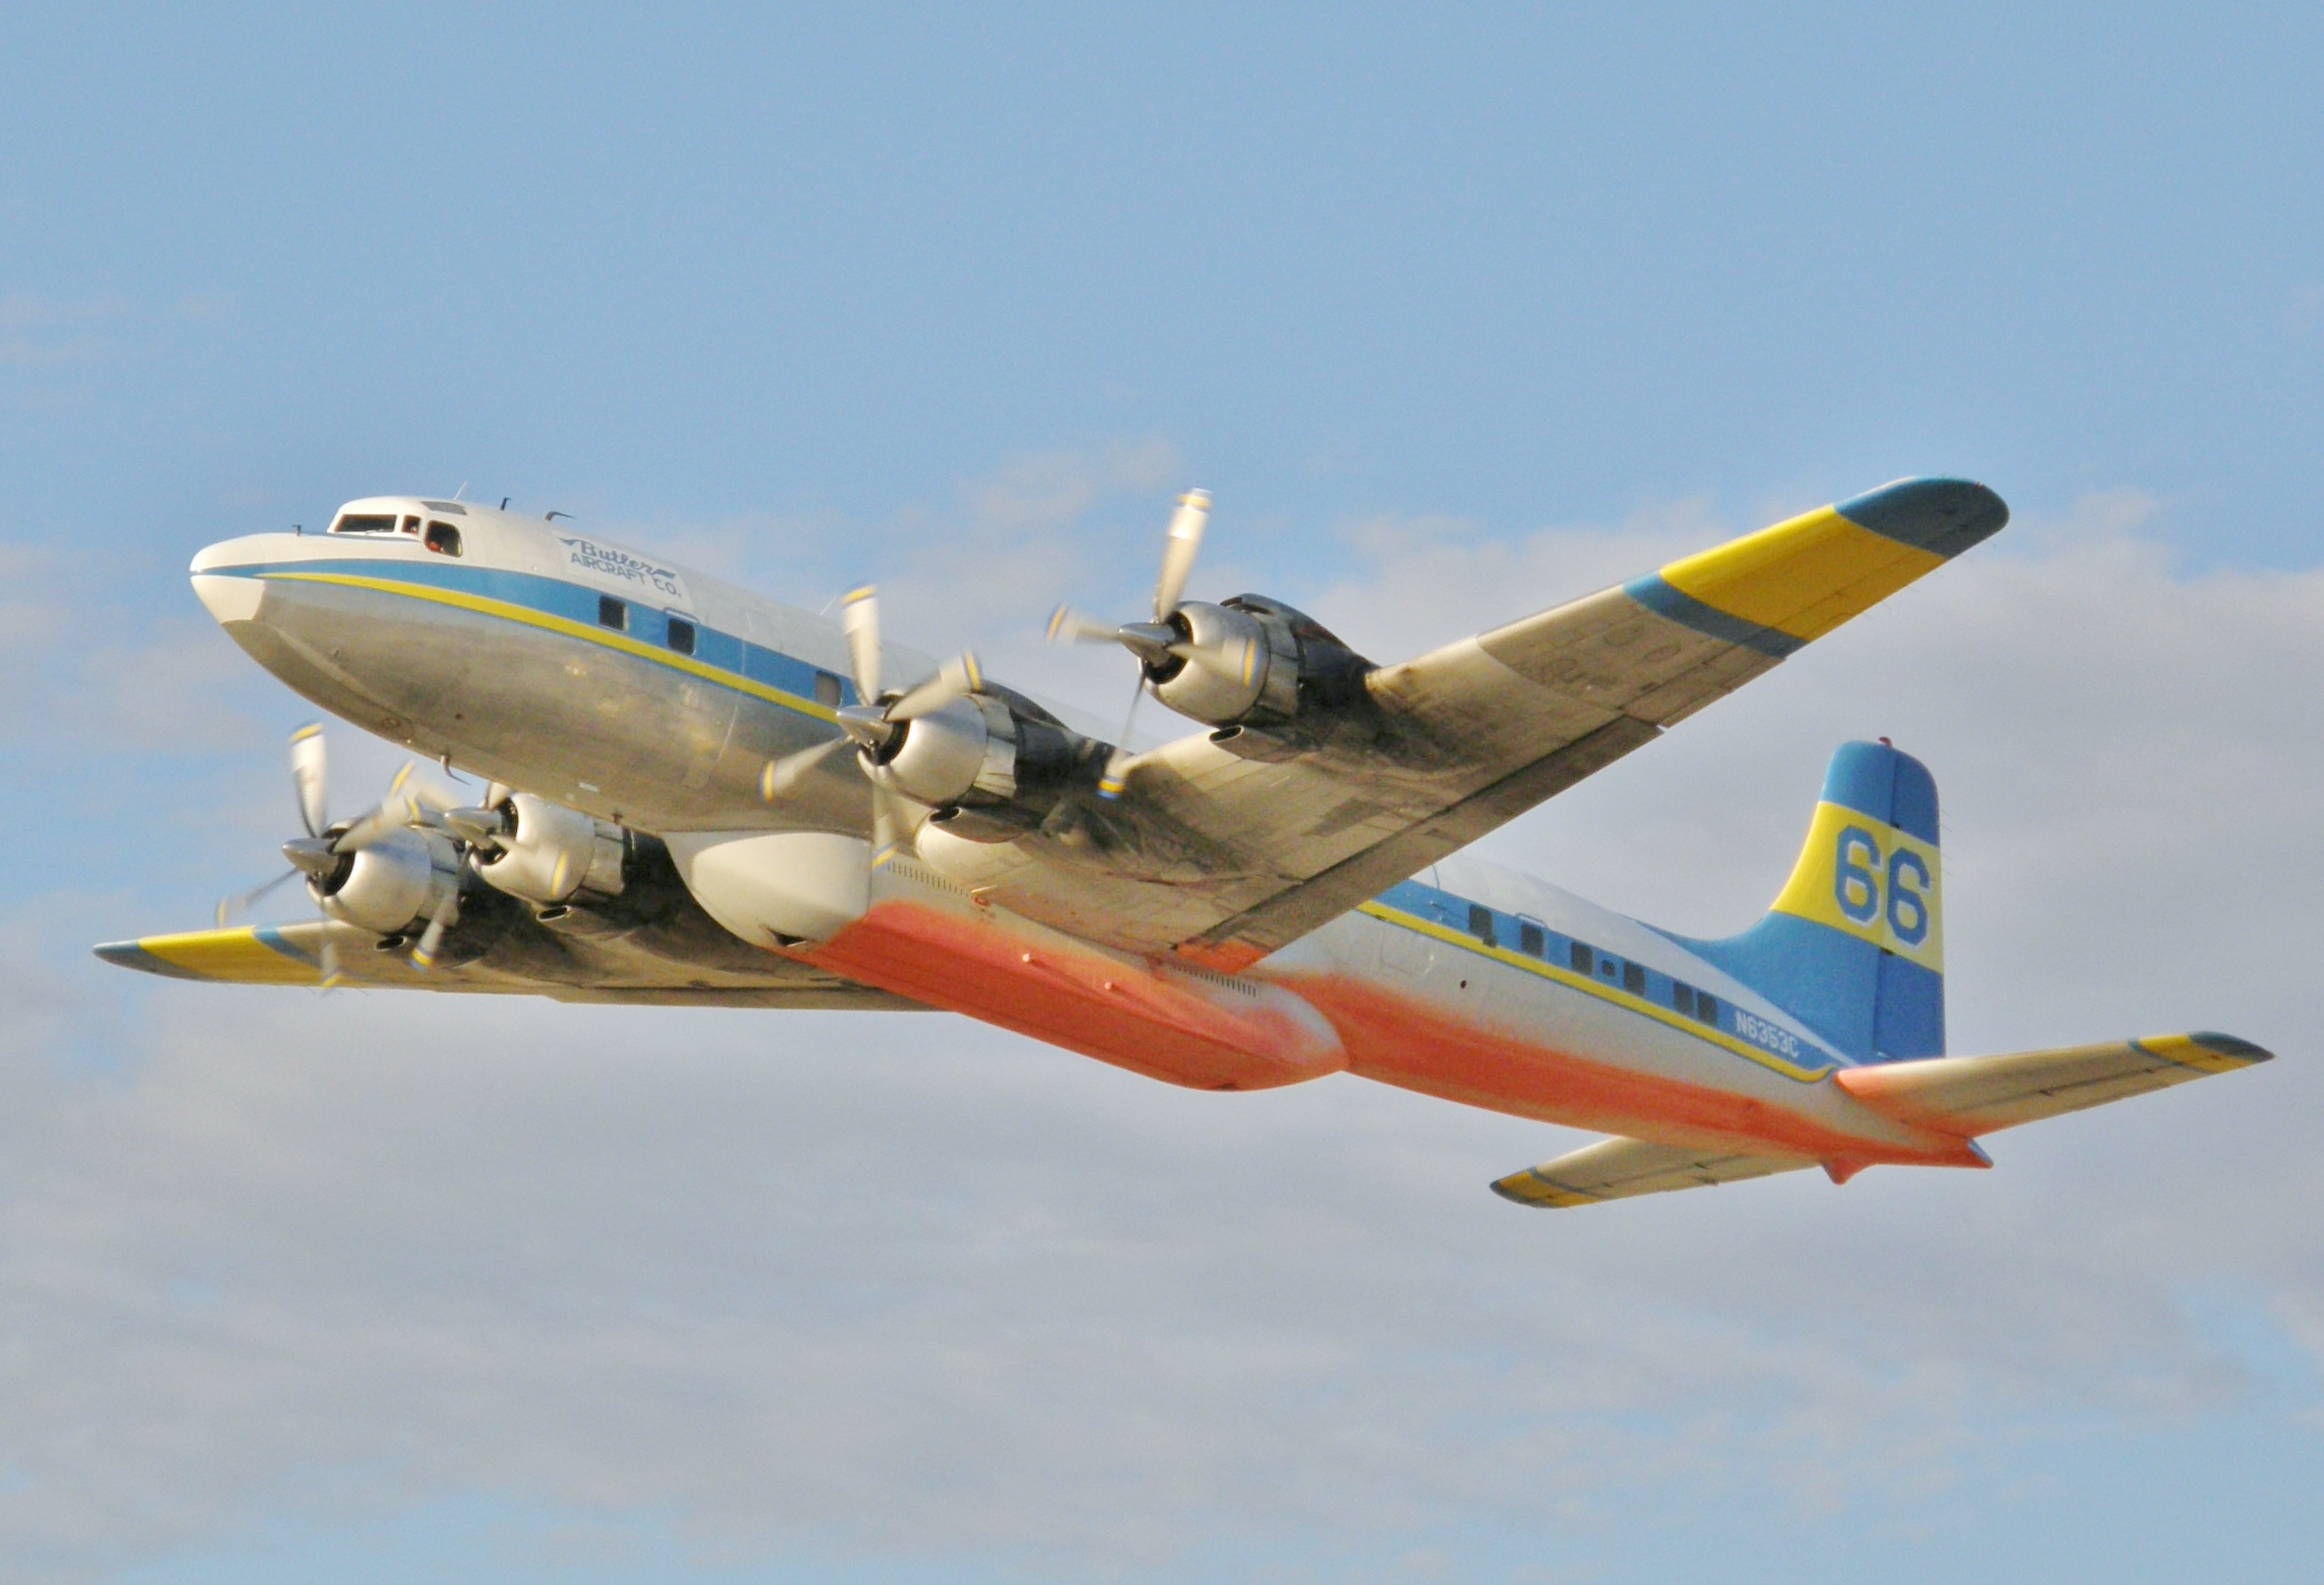 Douglas DC-7 - Wikipedia